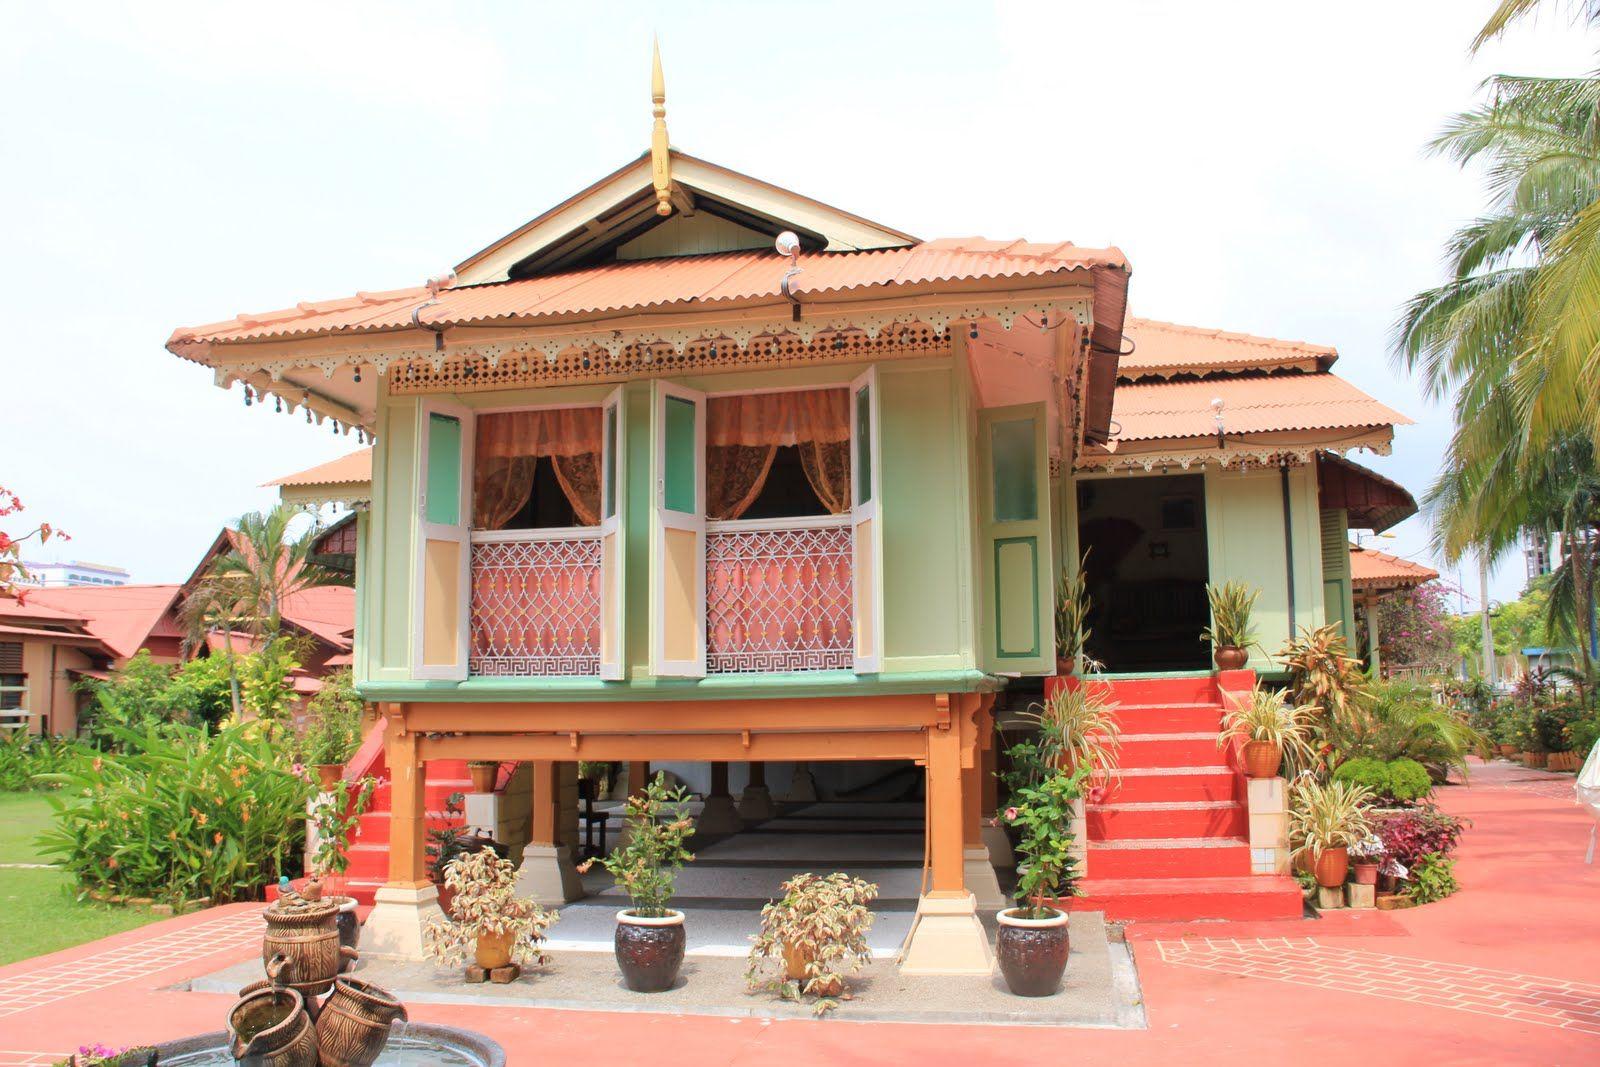 malay kampung house design Home Design 32+ Malay Kampung House Design Pictures